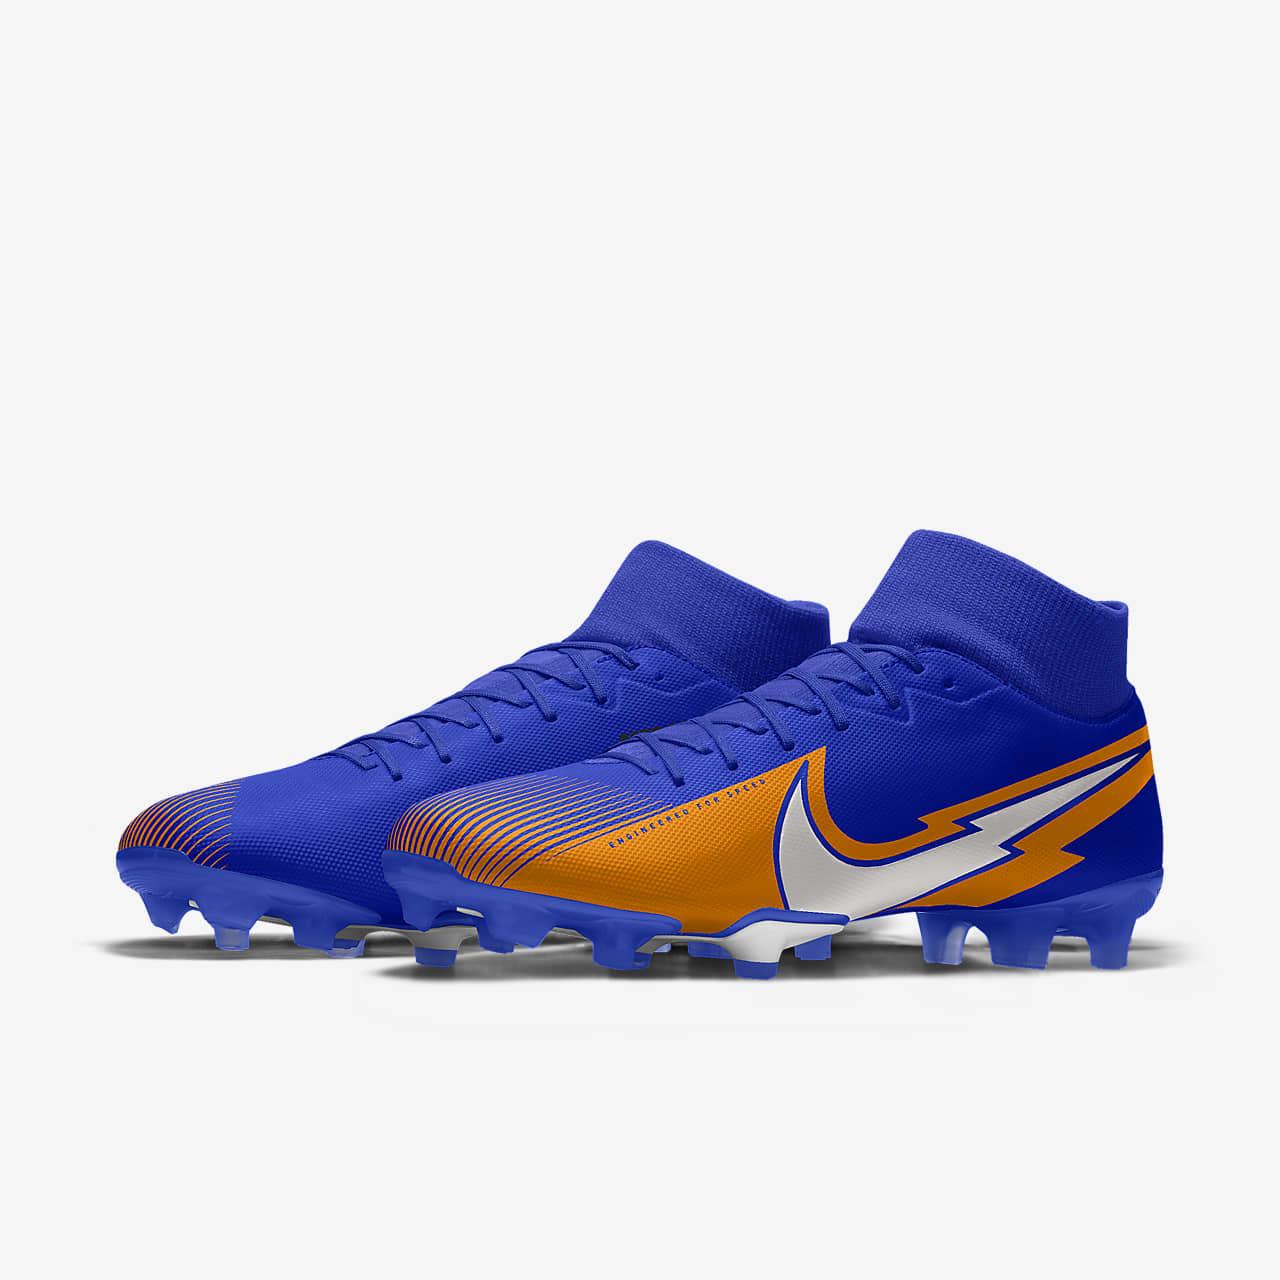 nike air max plus, Nike Mercurial Superfly Men's Football